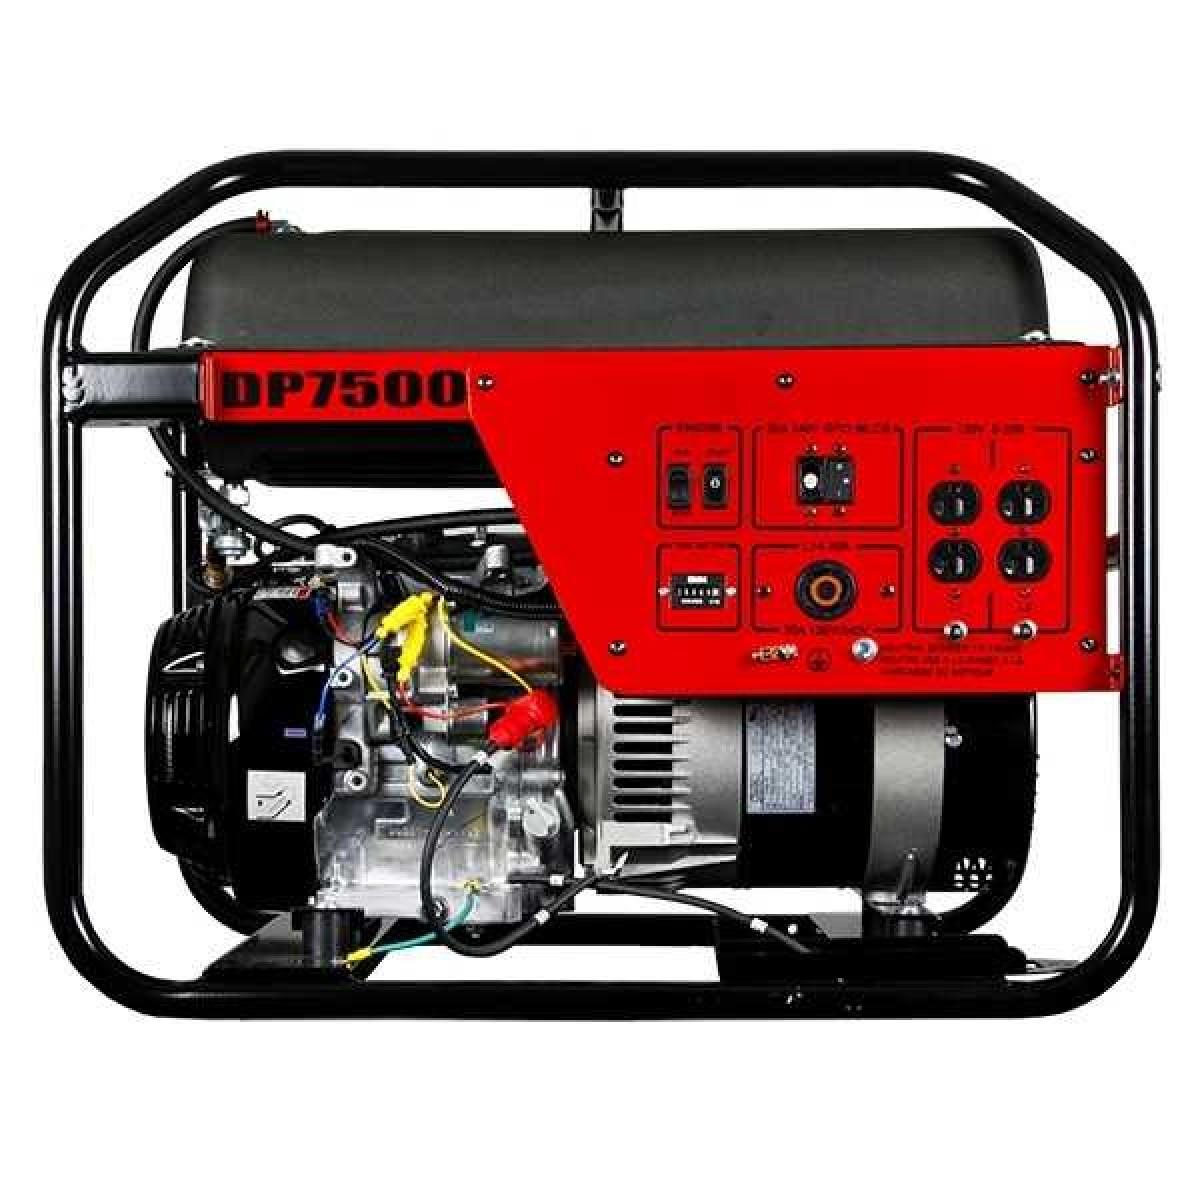 Winco Dp7500 Dyna Professional Series Honda Portable Gas